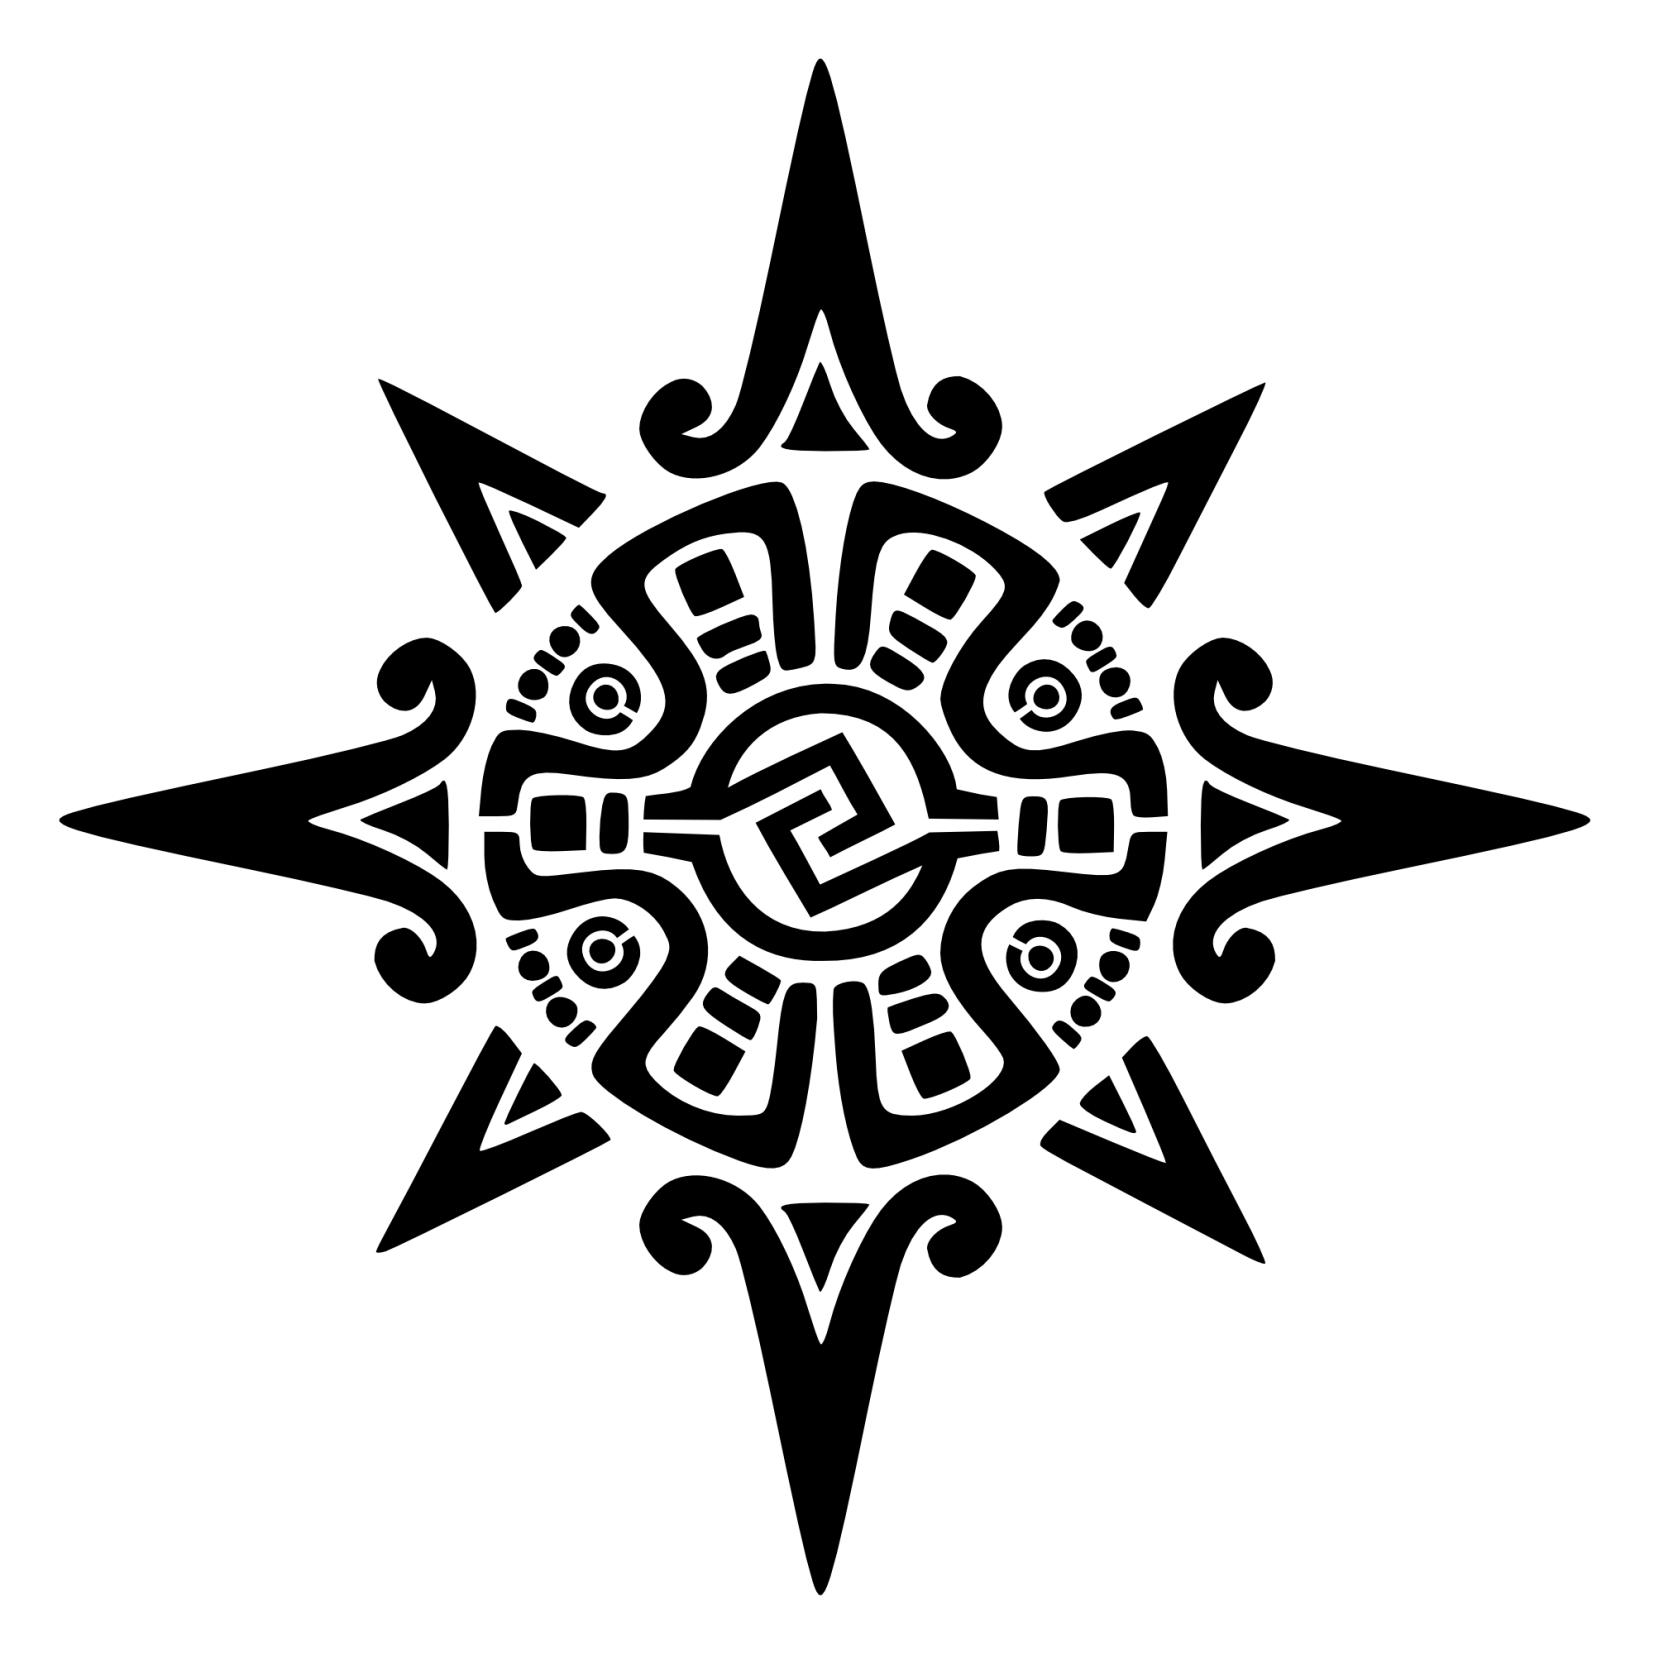 Aztec Sun God Tattoo Design